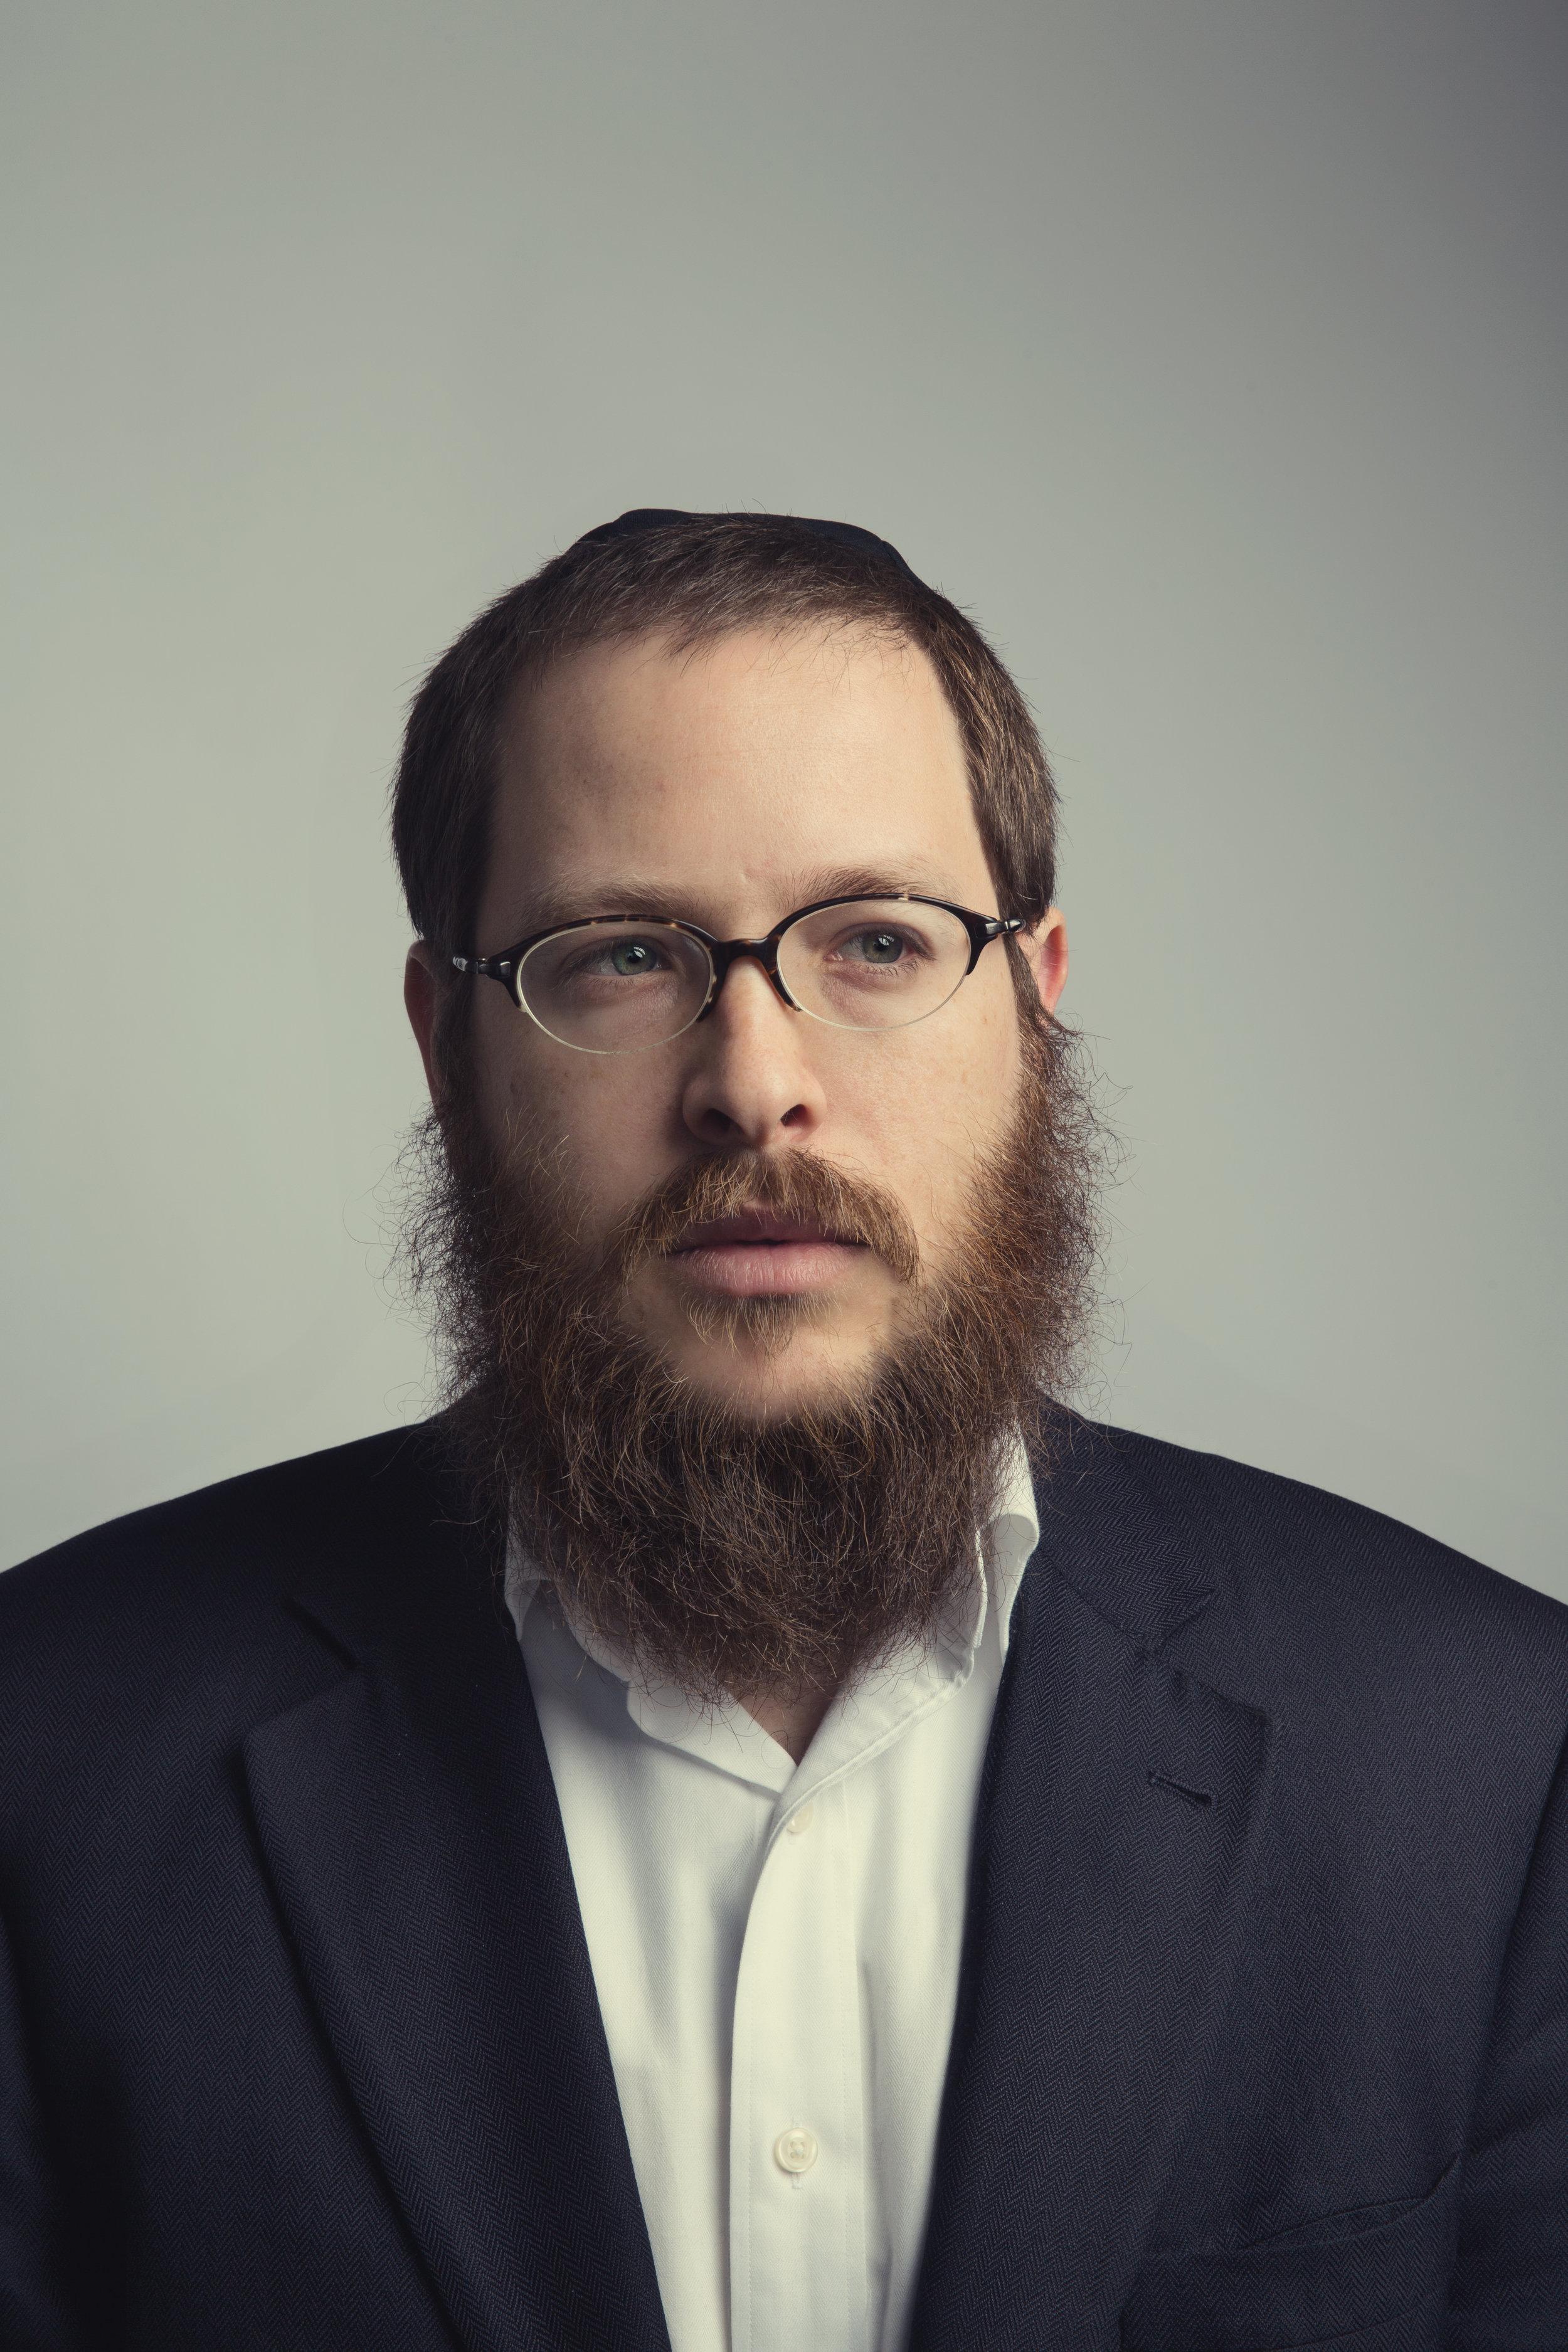 Rabbi Yudi Steiner